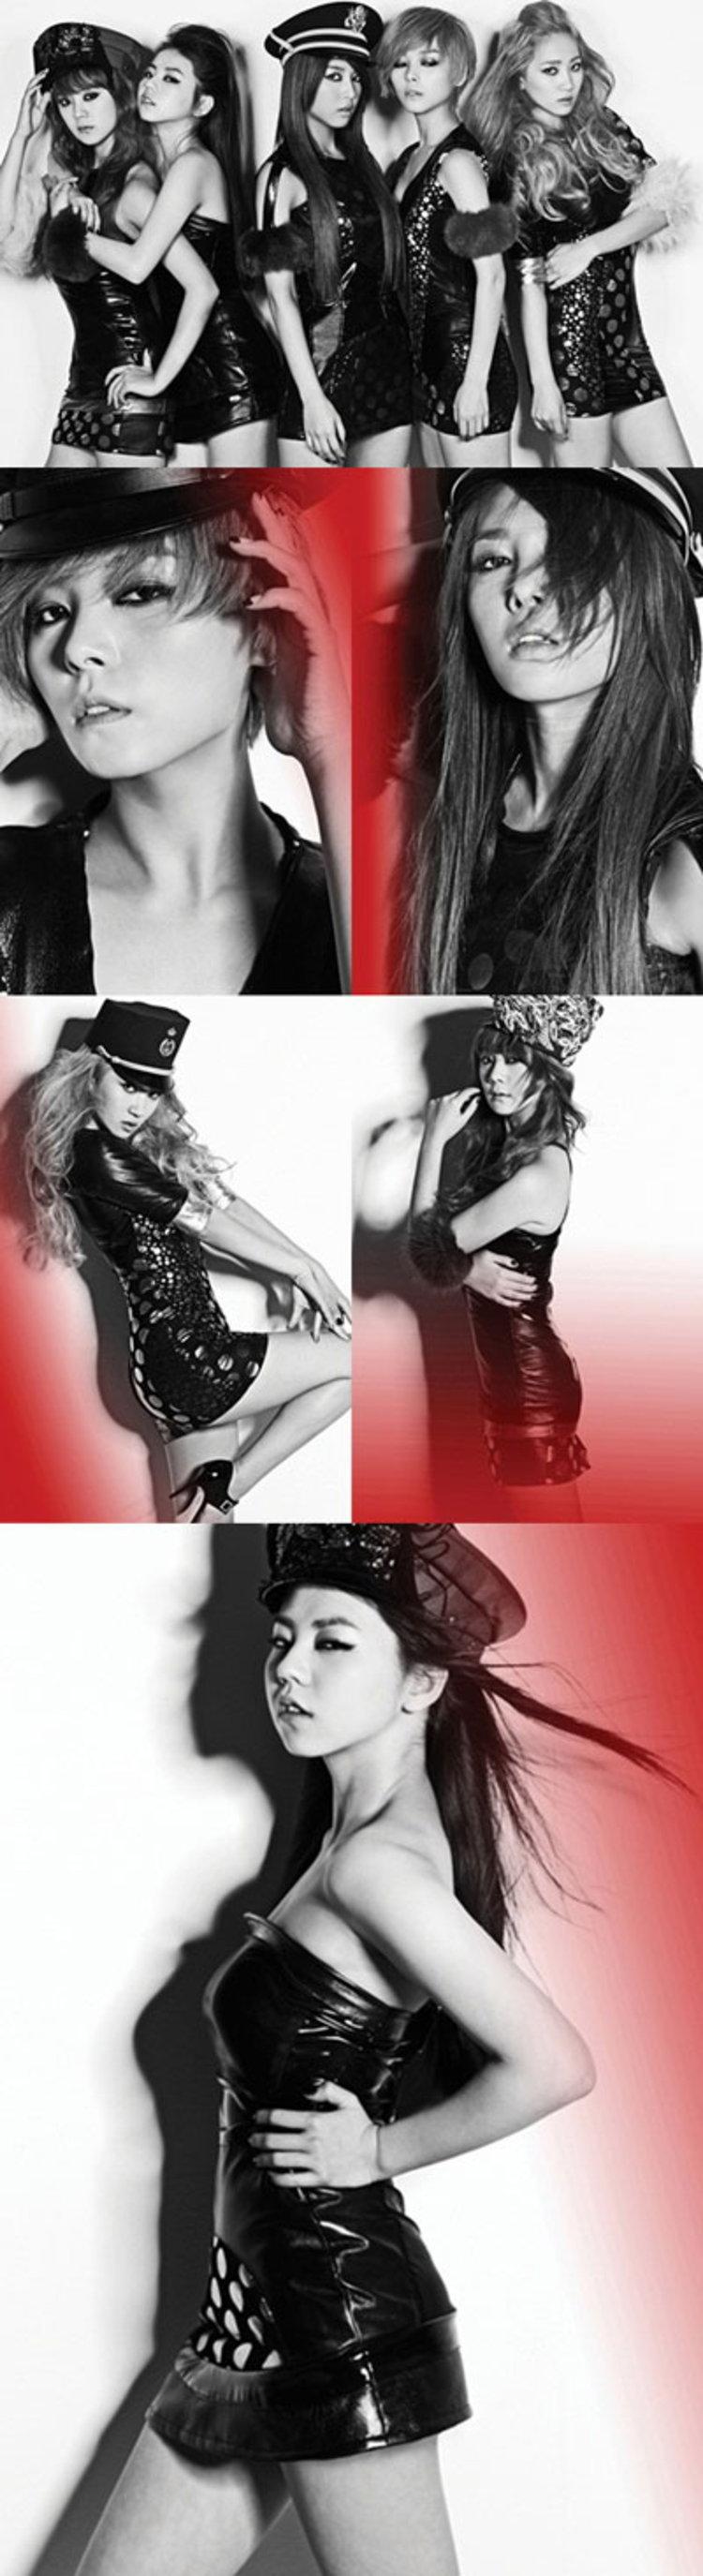 Wonder Girls เปิดตัวทีเซอร์คัมแบ็คชุดที่ 2 RED WONDER GIRLS